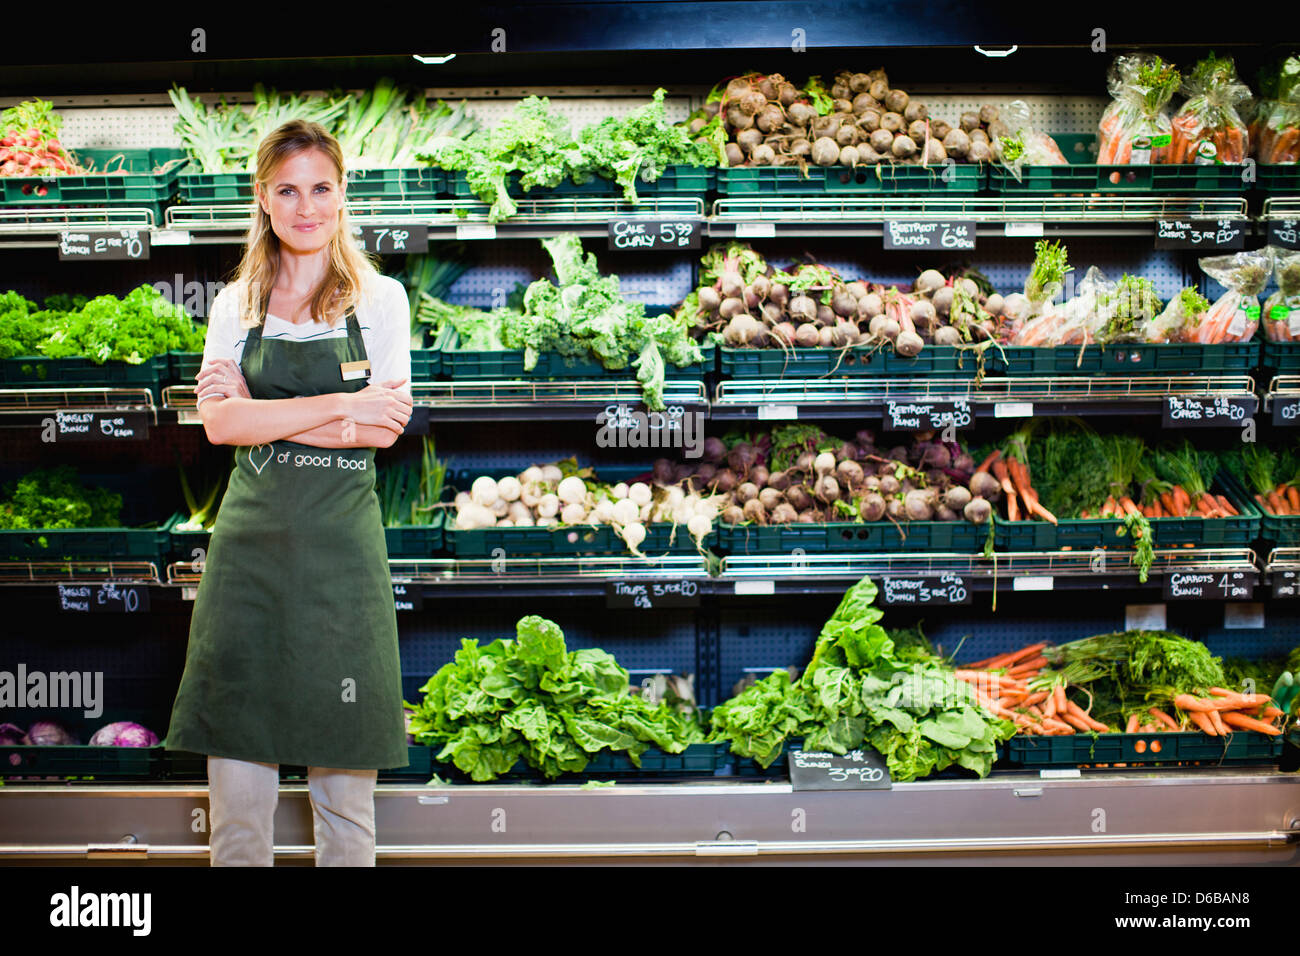 Lebensmittelhändler lächelnd in produzieren Abschnitt Stockbild